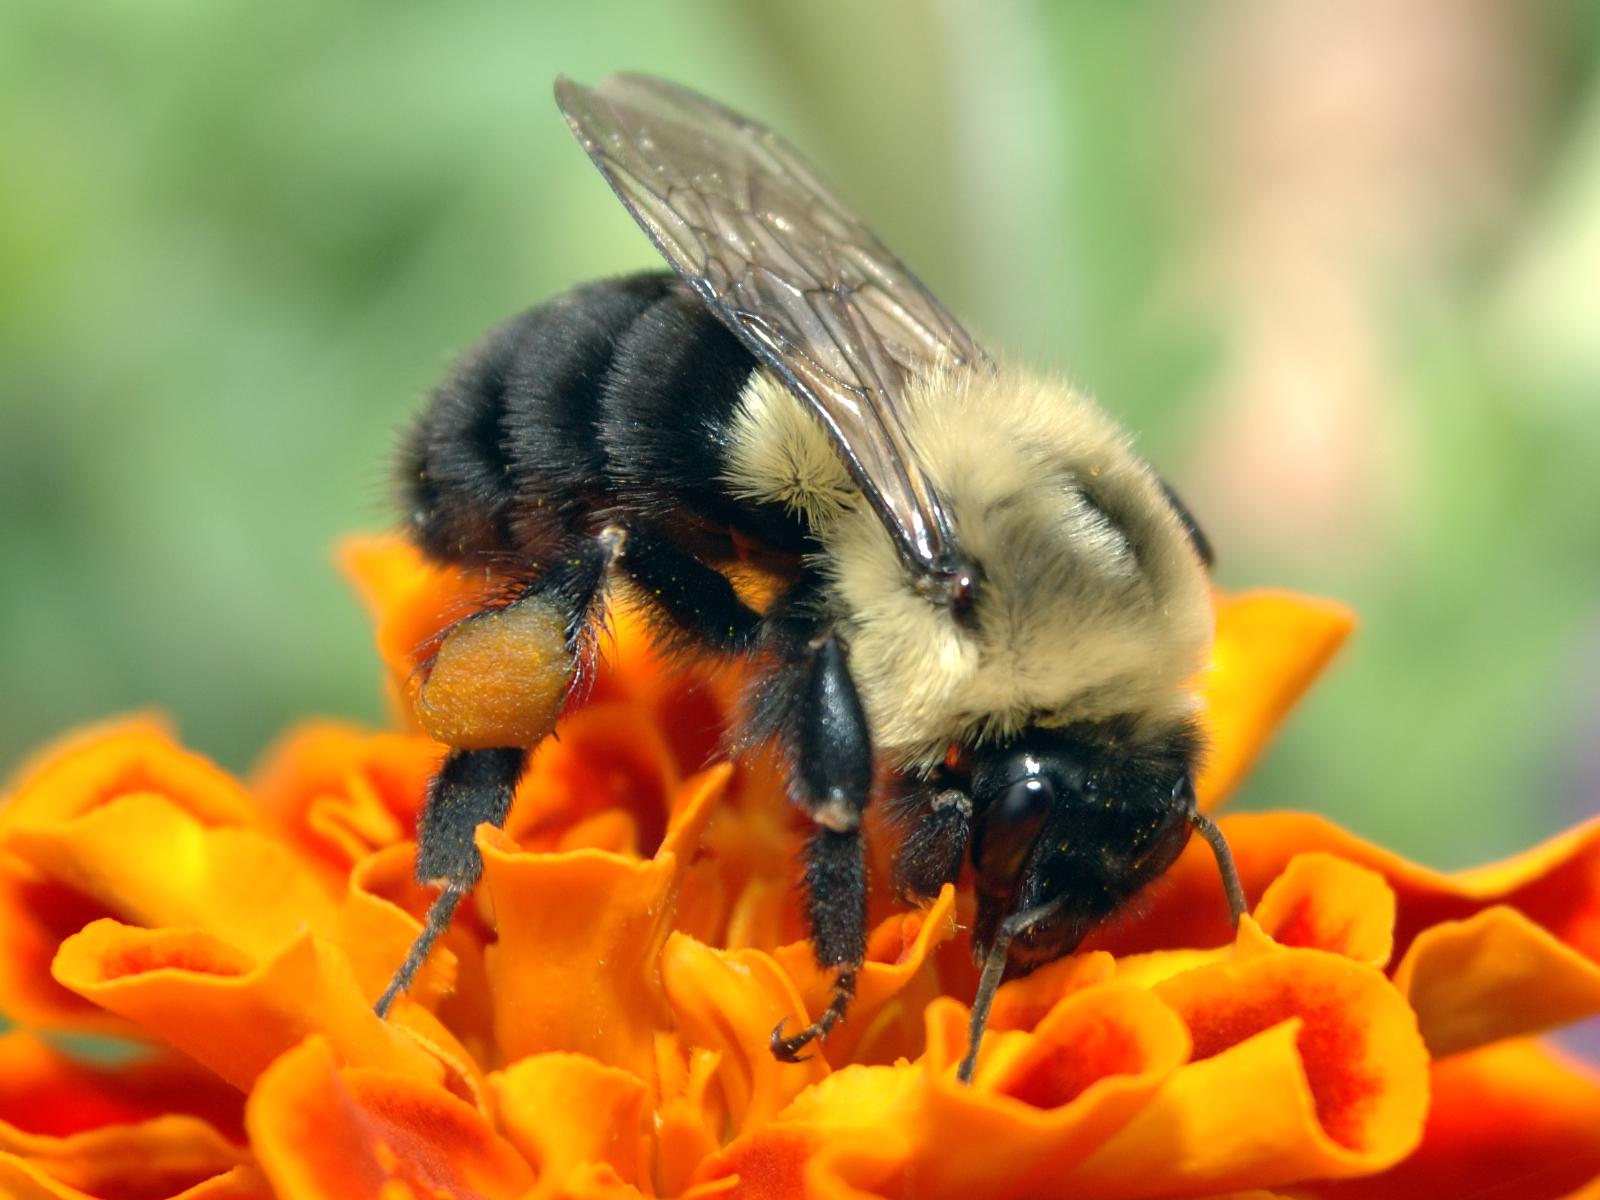 Пчела на оранжевом цветке - обои для ...: zastavki.com/rus/animals/insects/wallpaper-58348.htm